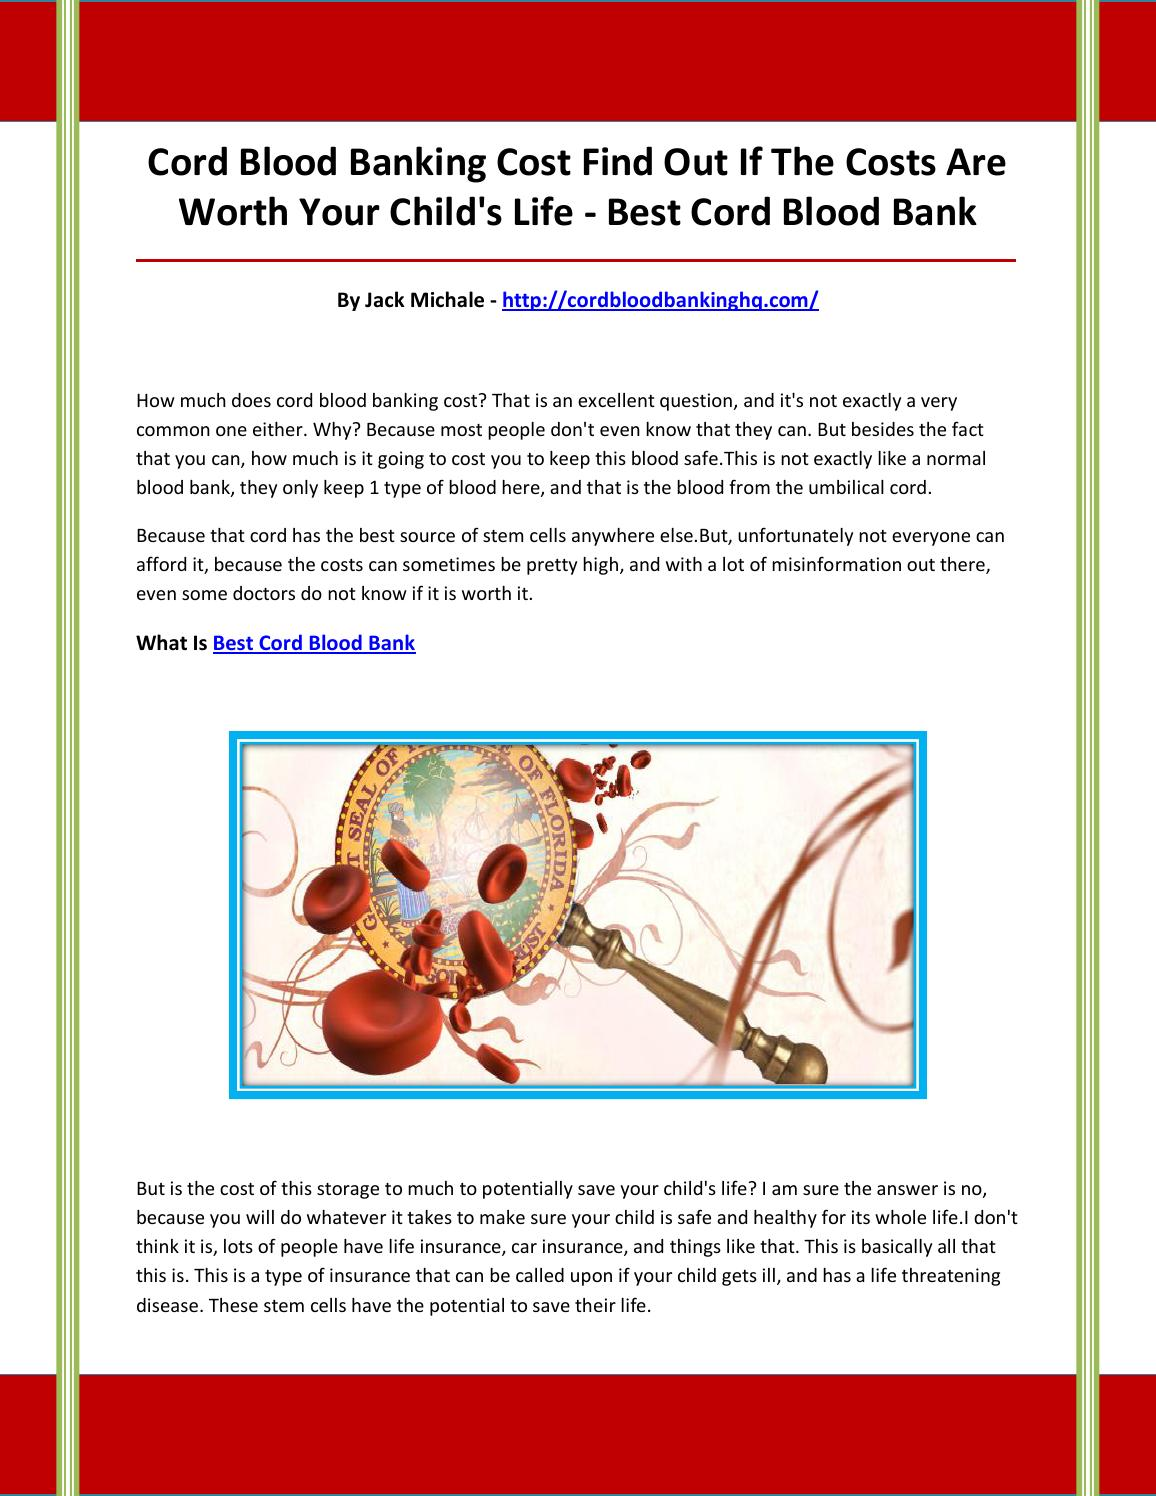 Cord Blood Banking Cost >> Best Cord Blood Bank By Vgfbvhgnbjgnbjbjk Issuu